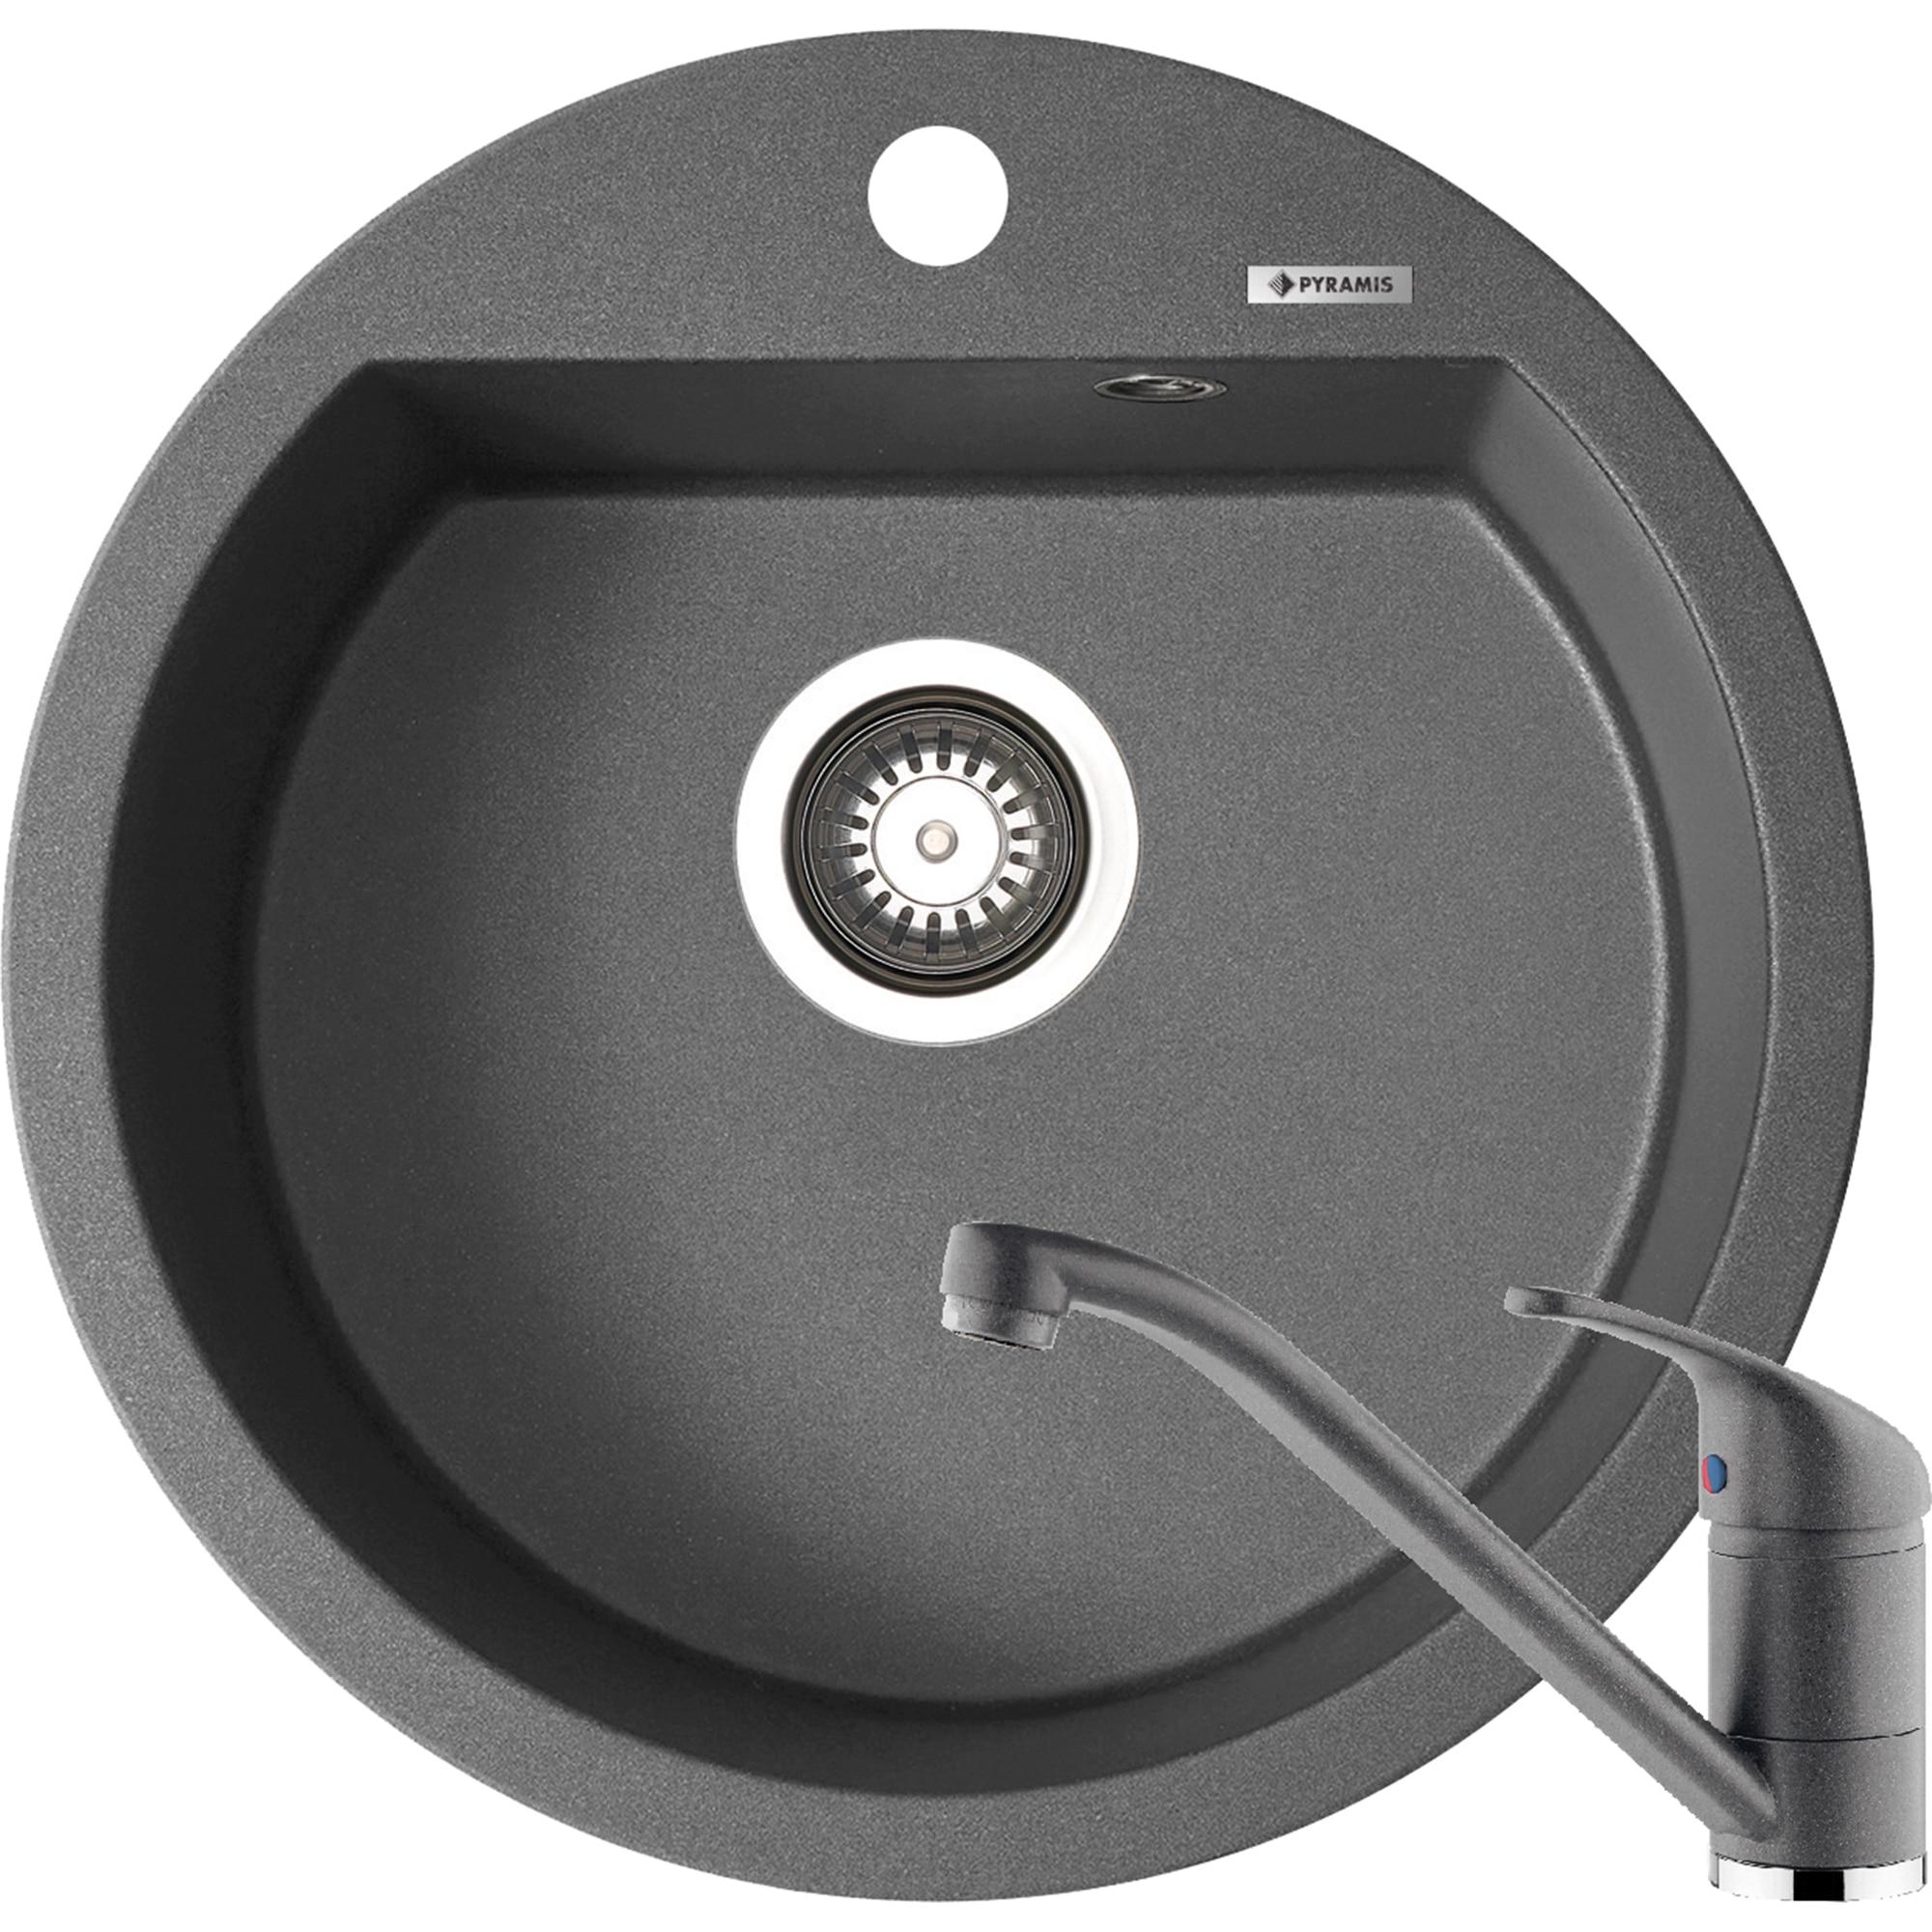 Fotografie Pachet chiuveta pyragranite + Baterie Pyramis Premium Piera, 1B, 510mm, adancime 200mm, Iron Grey